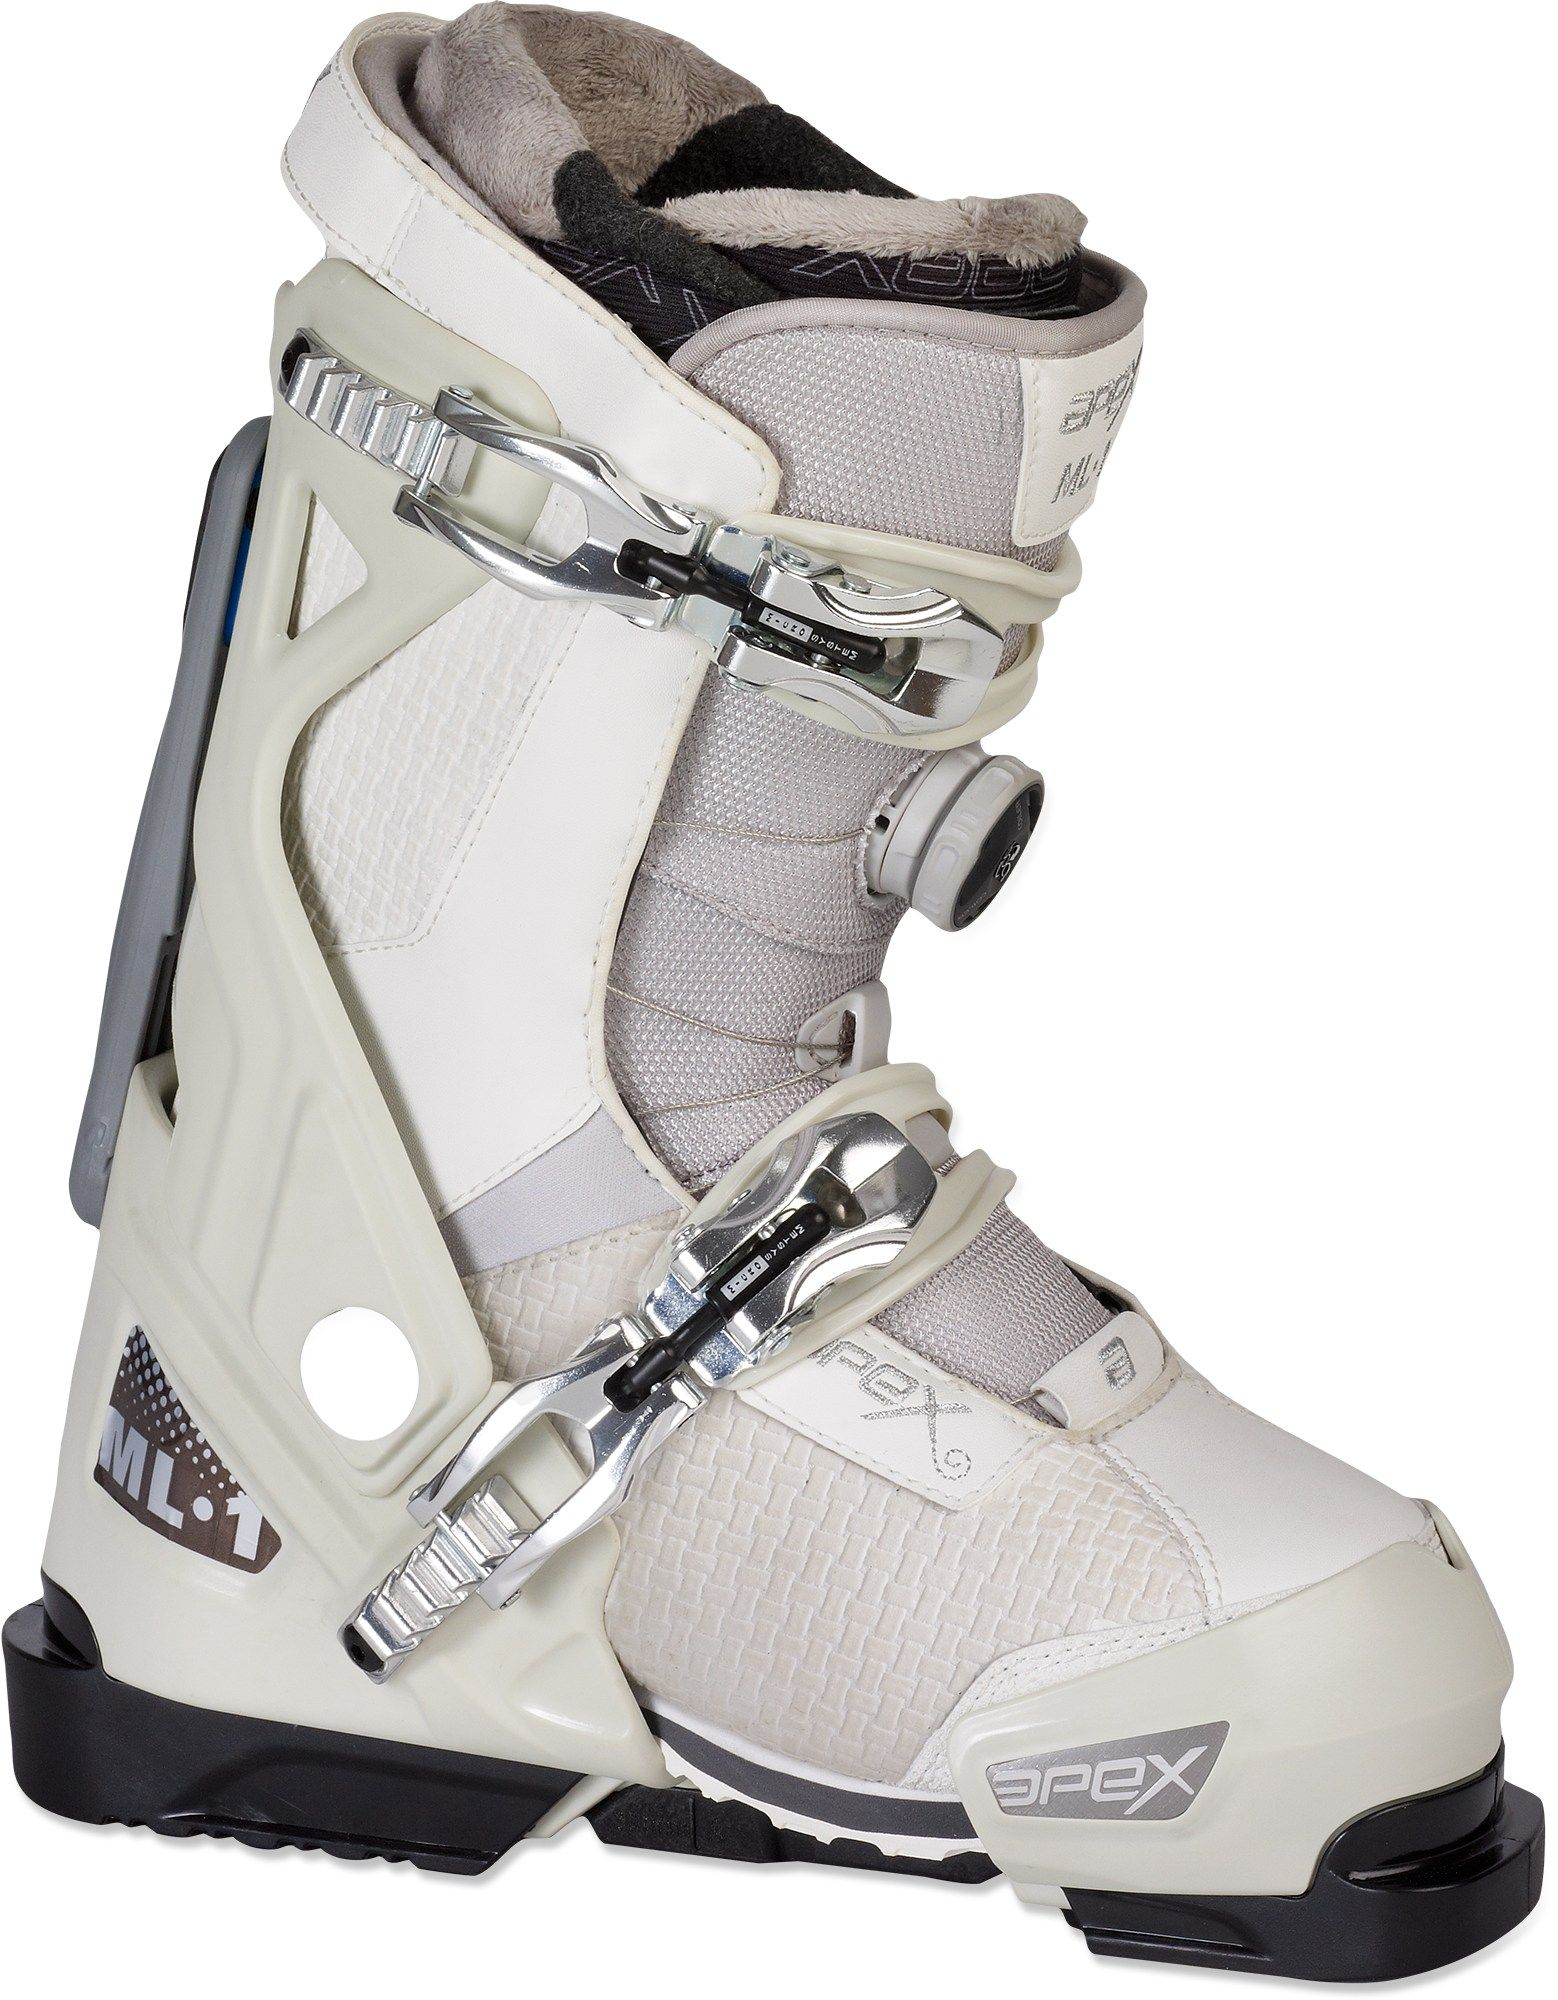 Apex Ski Boots Female Ml-1 All Mountain Ski Boots - Women's /